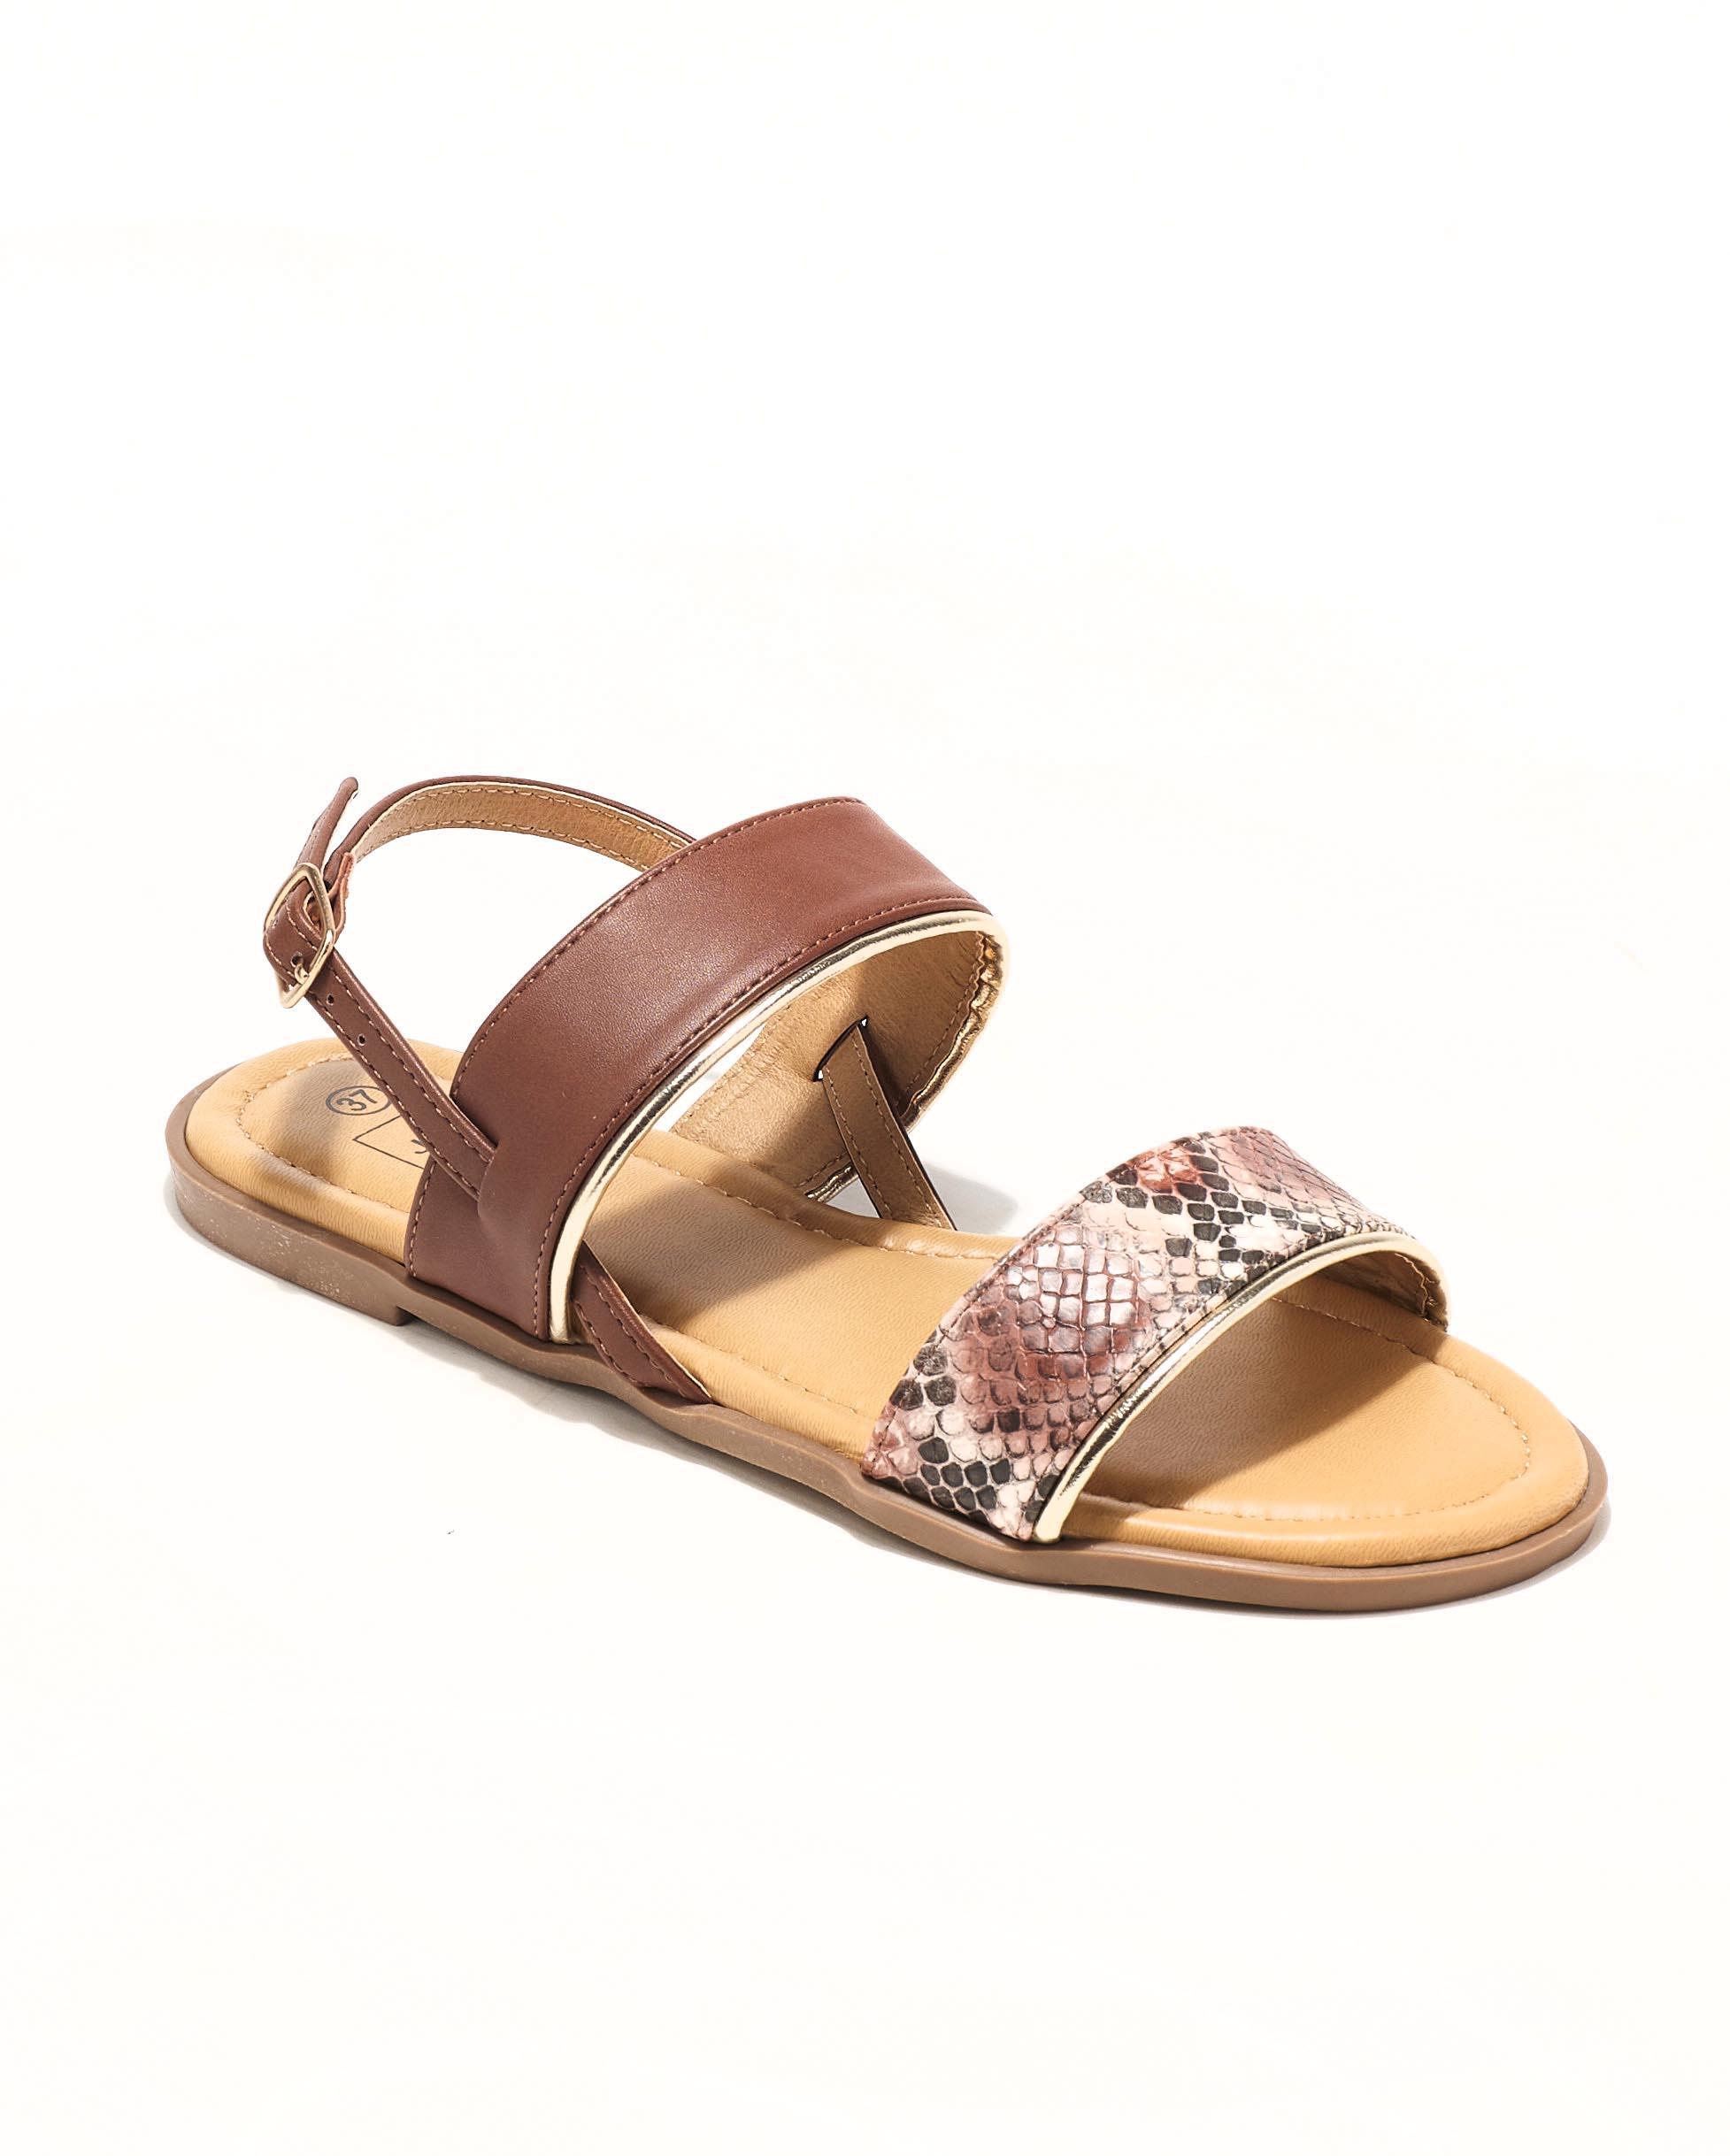 Sandales Plates Femme - Sandale Plate Python Marron Jina - Style 4 Zh P06